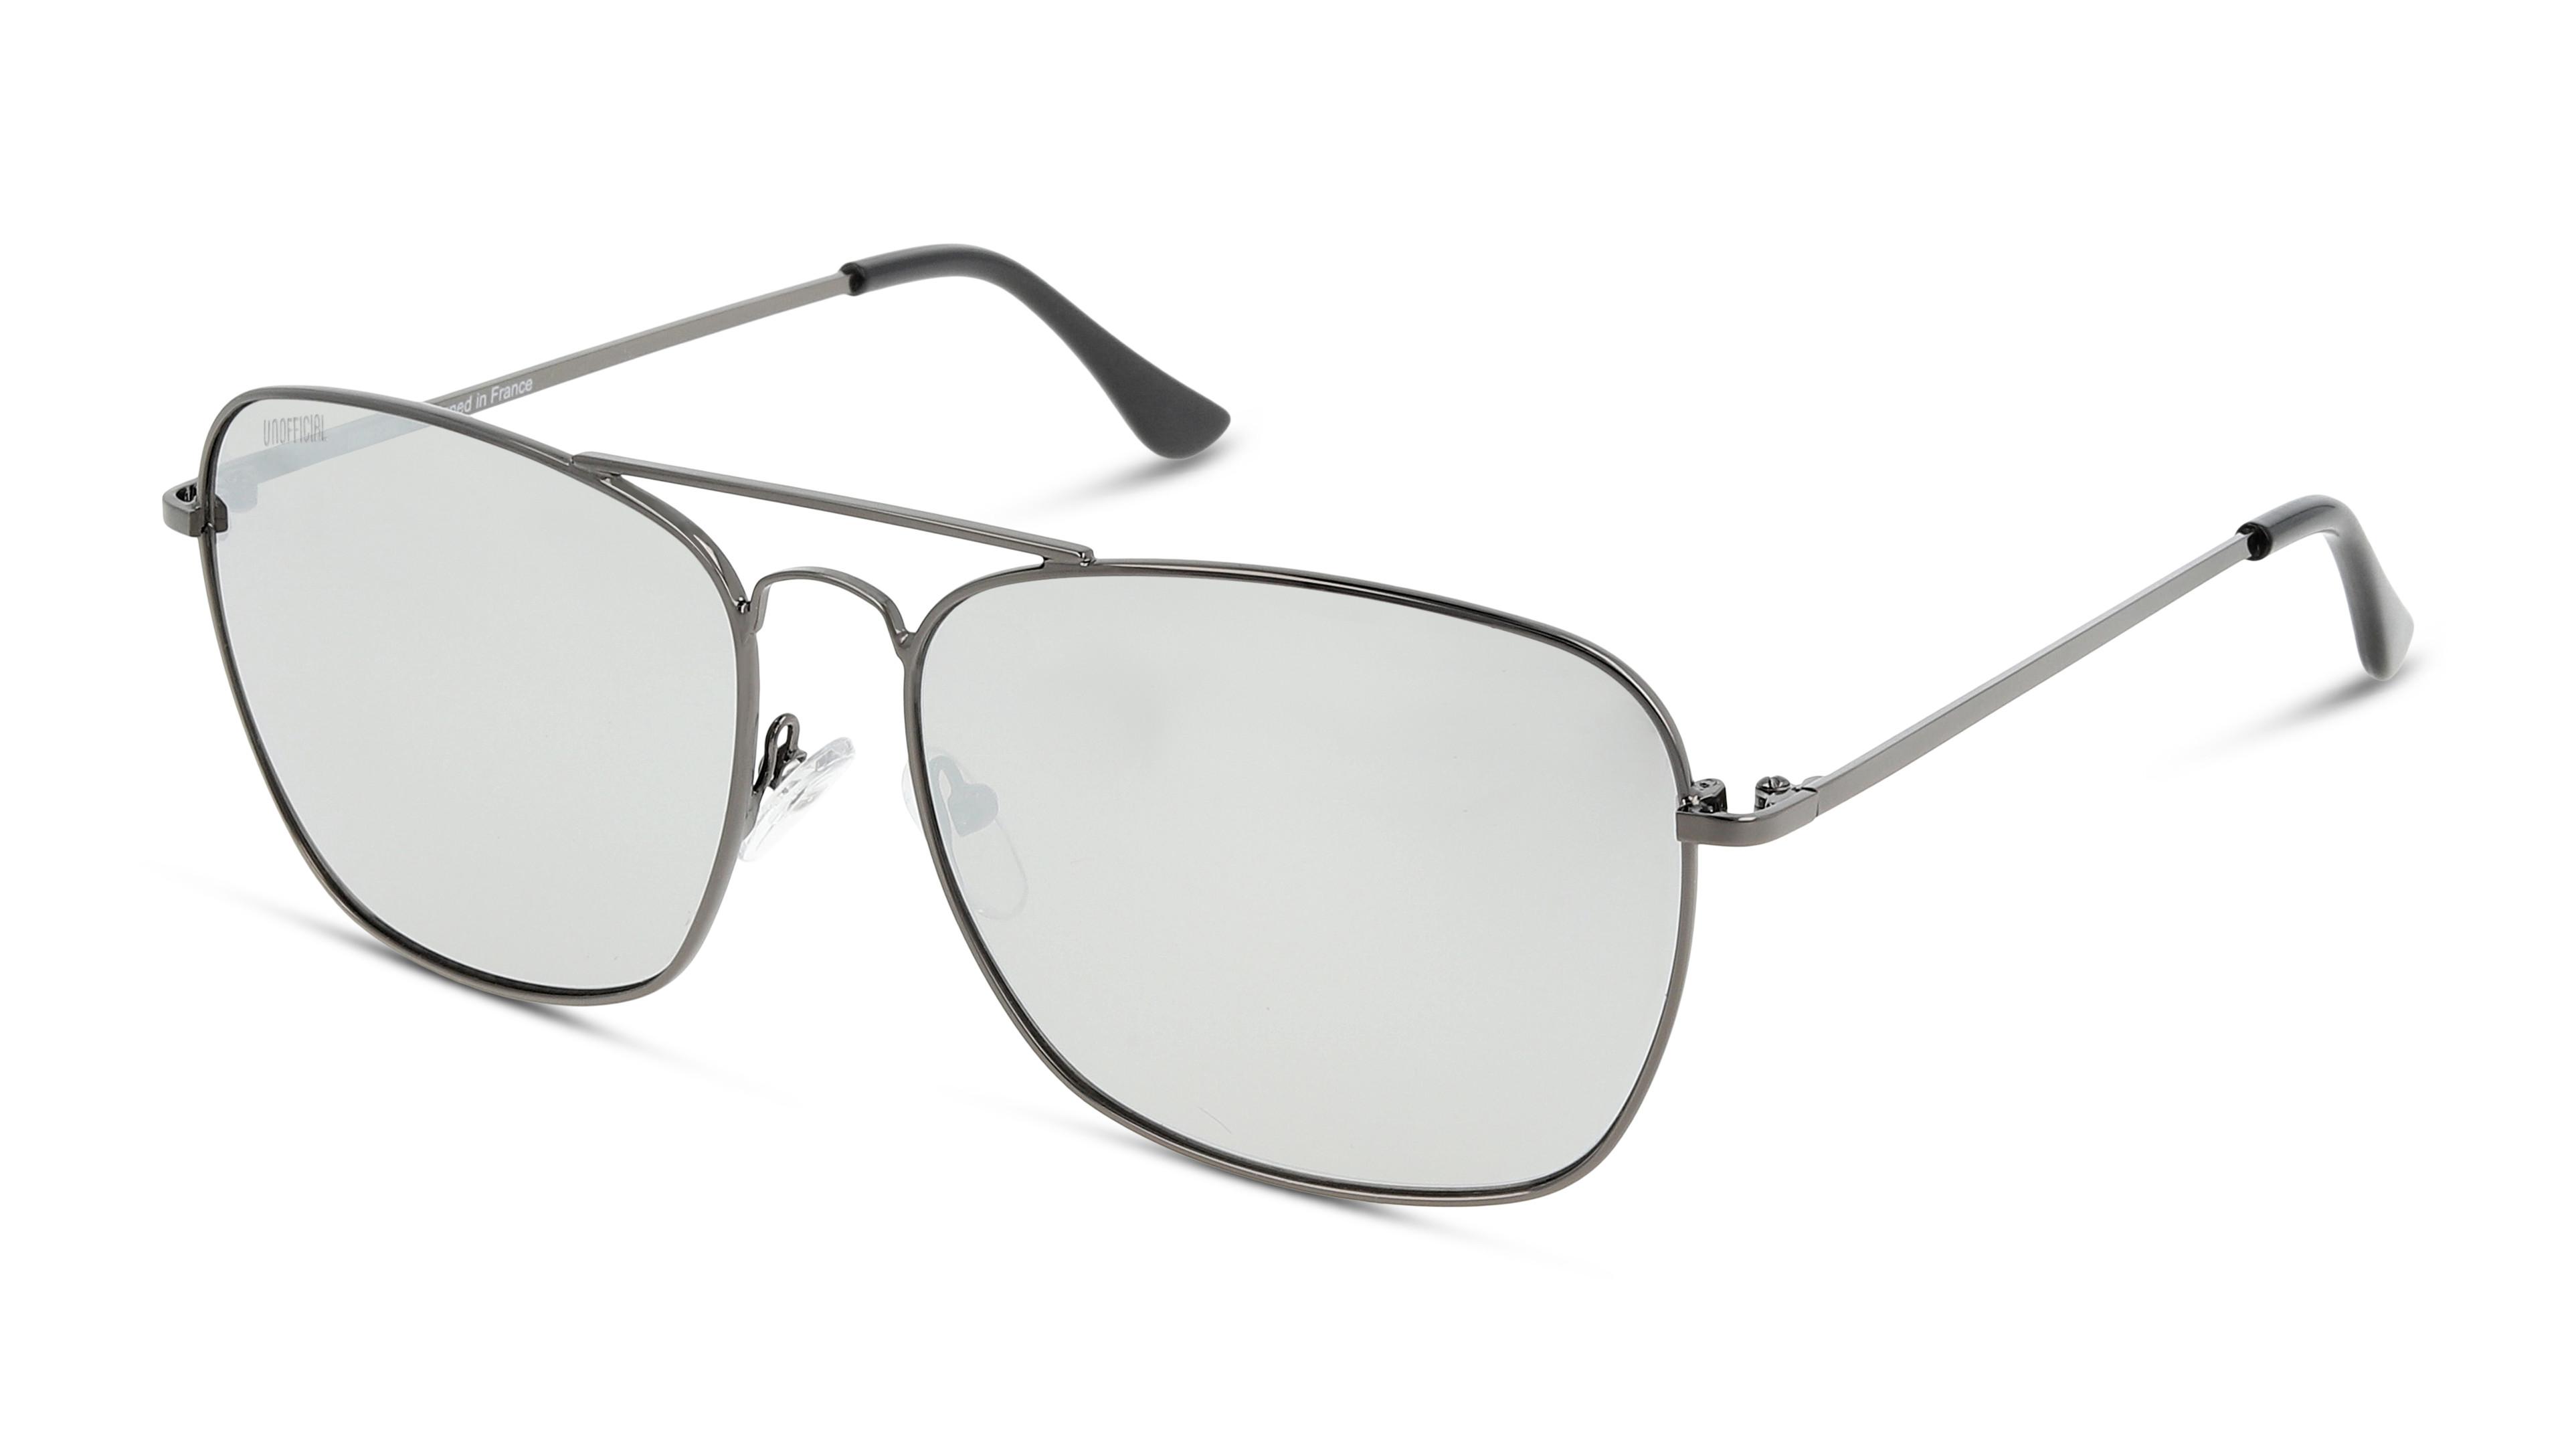 8719154730061-angle-03-unofficial-unsm0017-eyewear-grey-silver